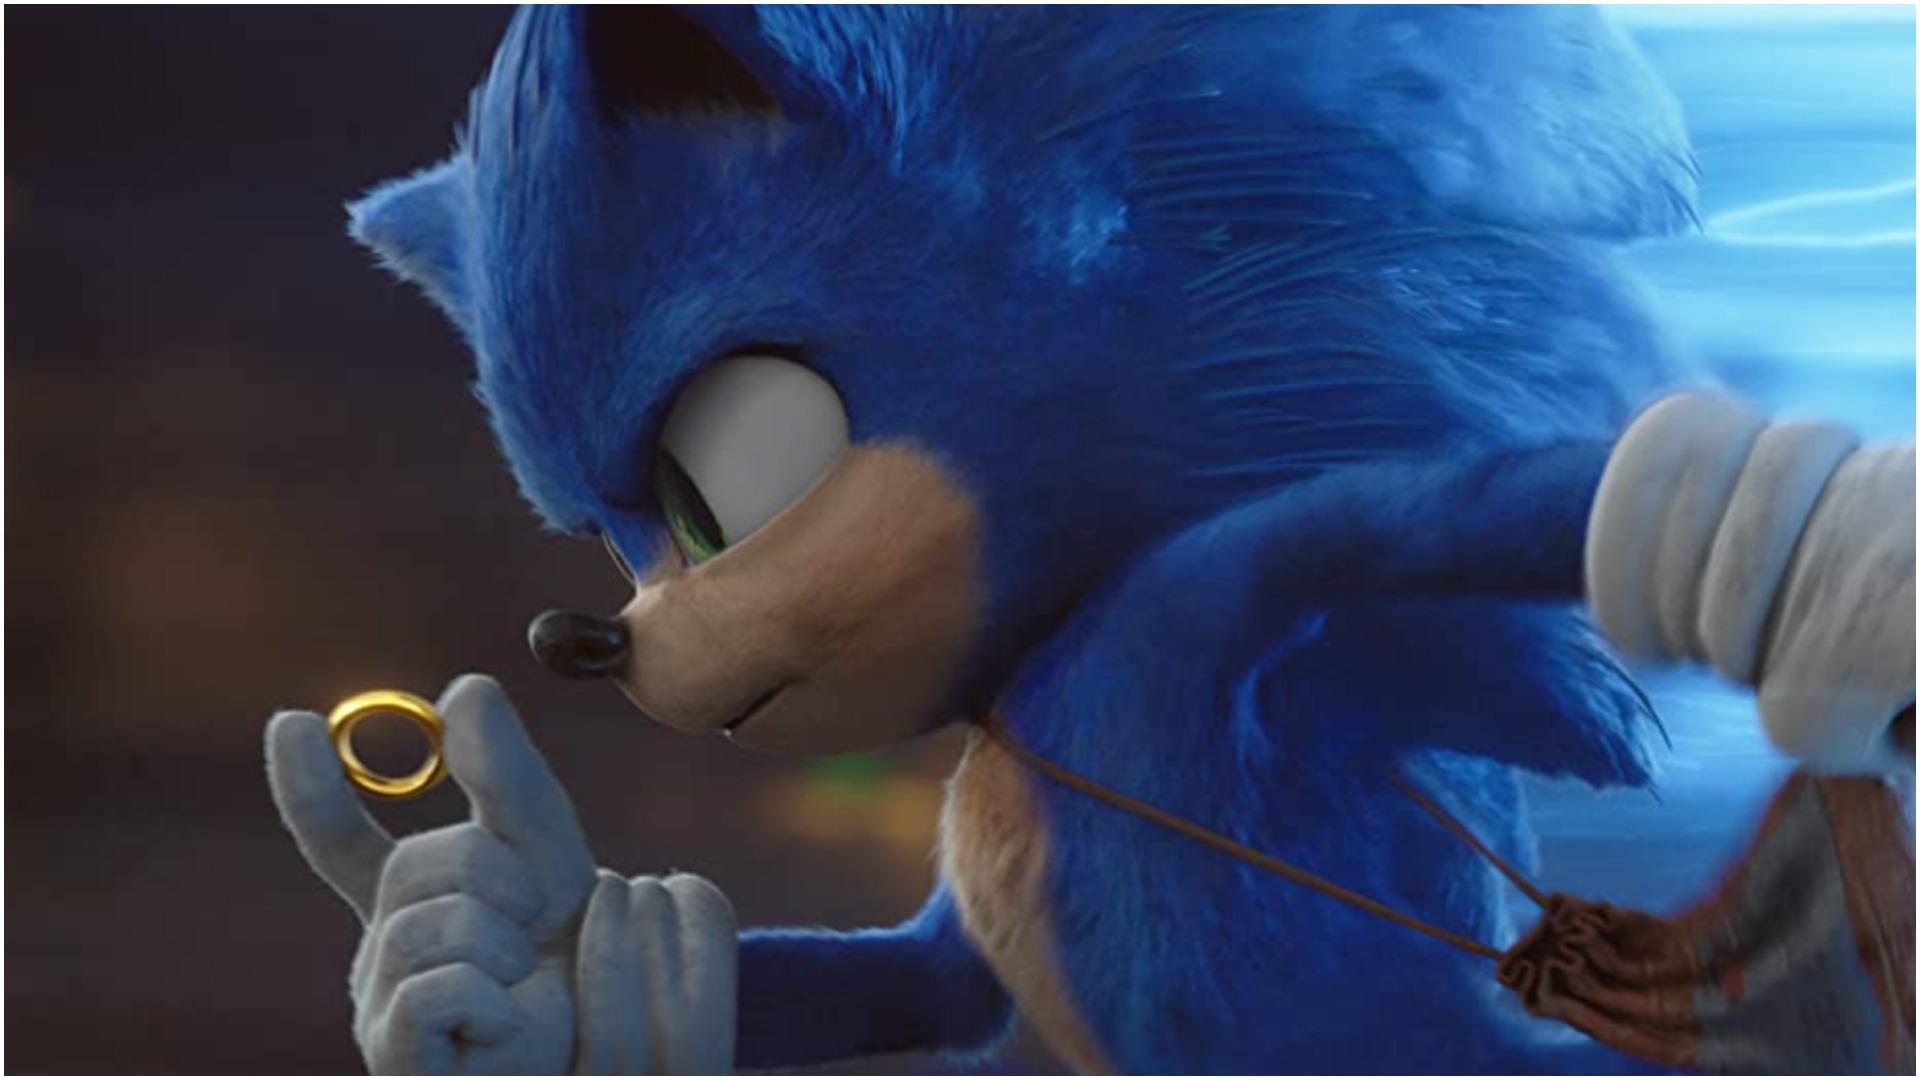 Sonic the Hedgehog 20 movie plot has been leaked online   GamesRadar+